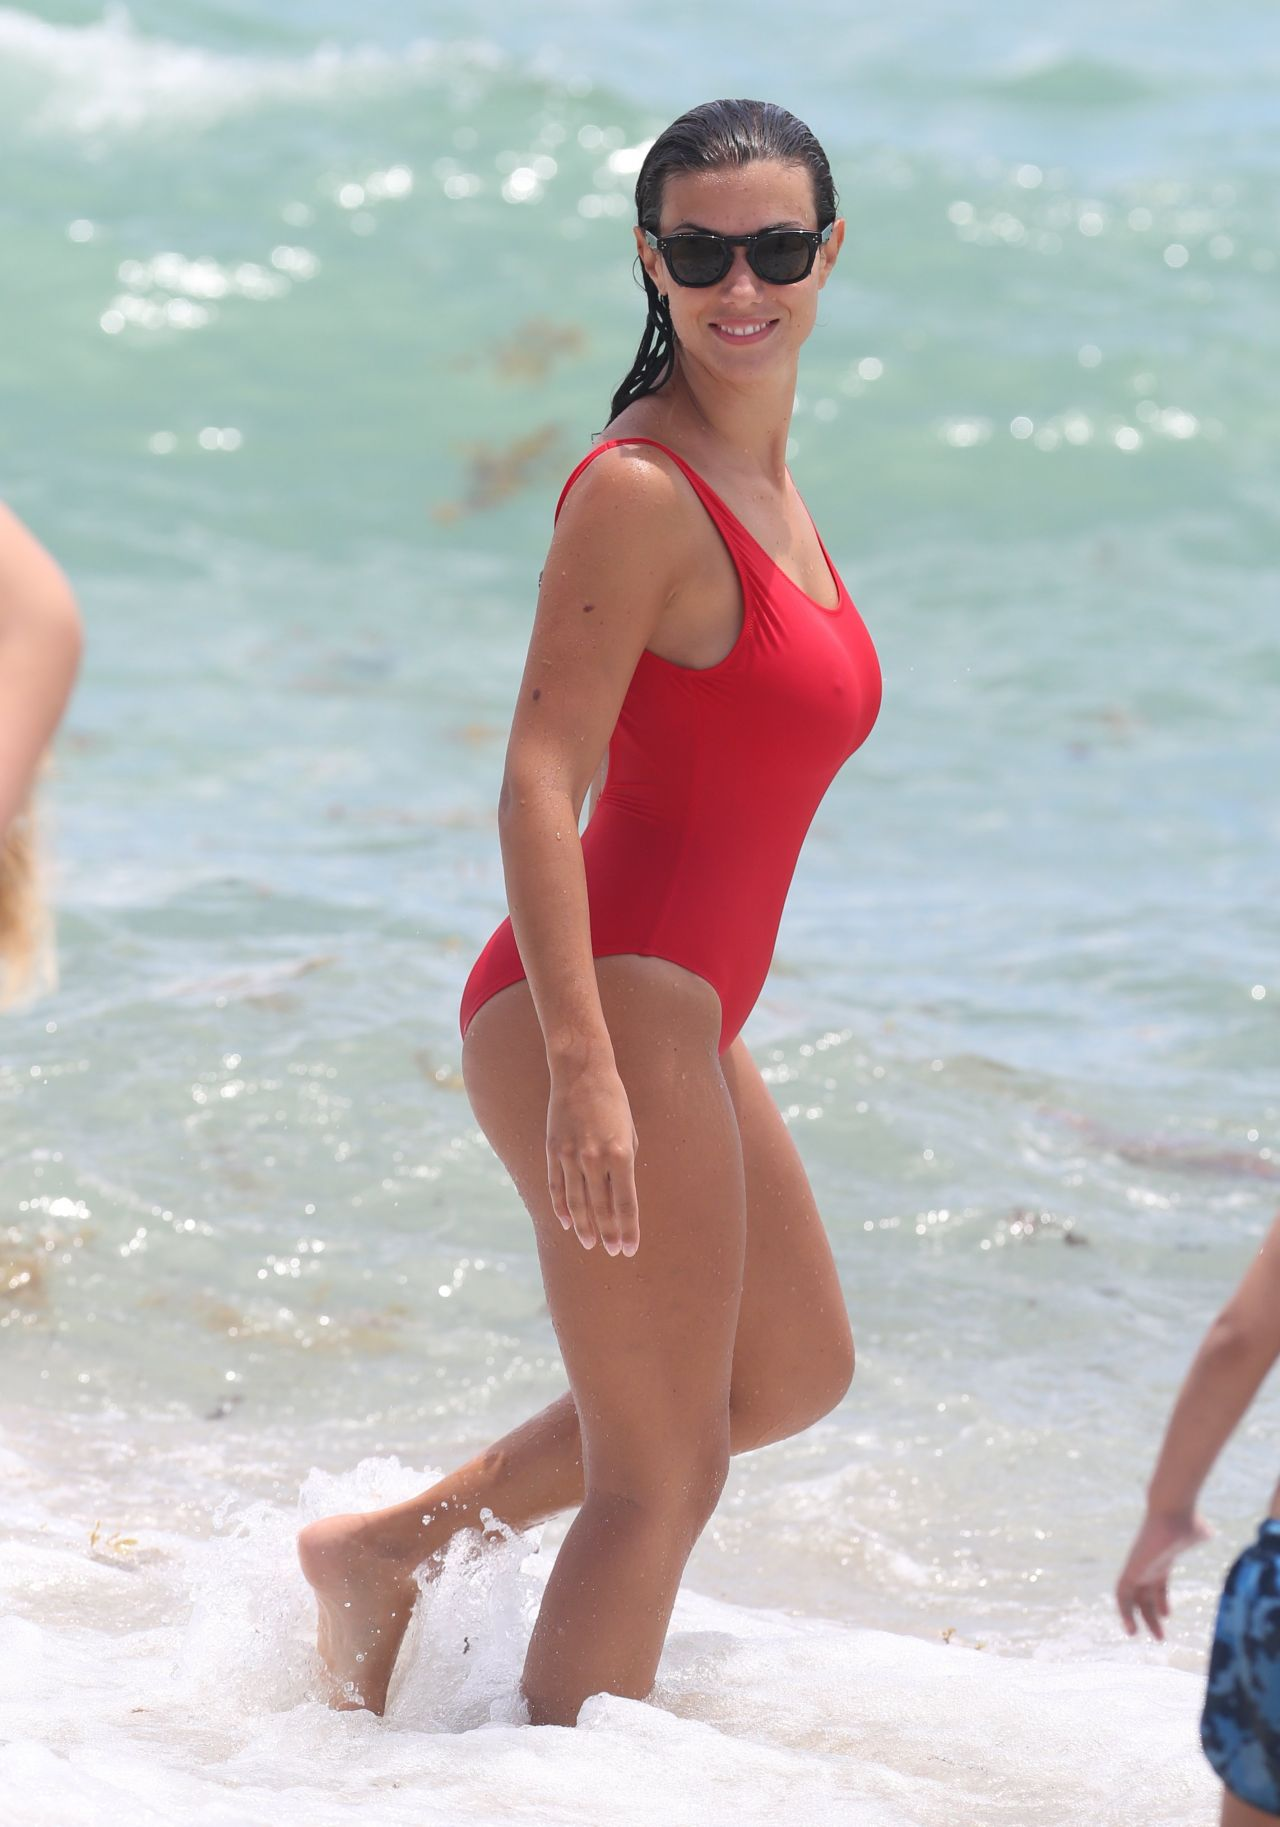 ludivine kadri sagna in a red swimsuit   vacations in miami 07 12 2017